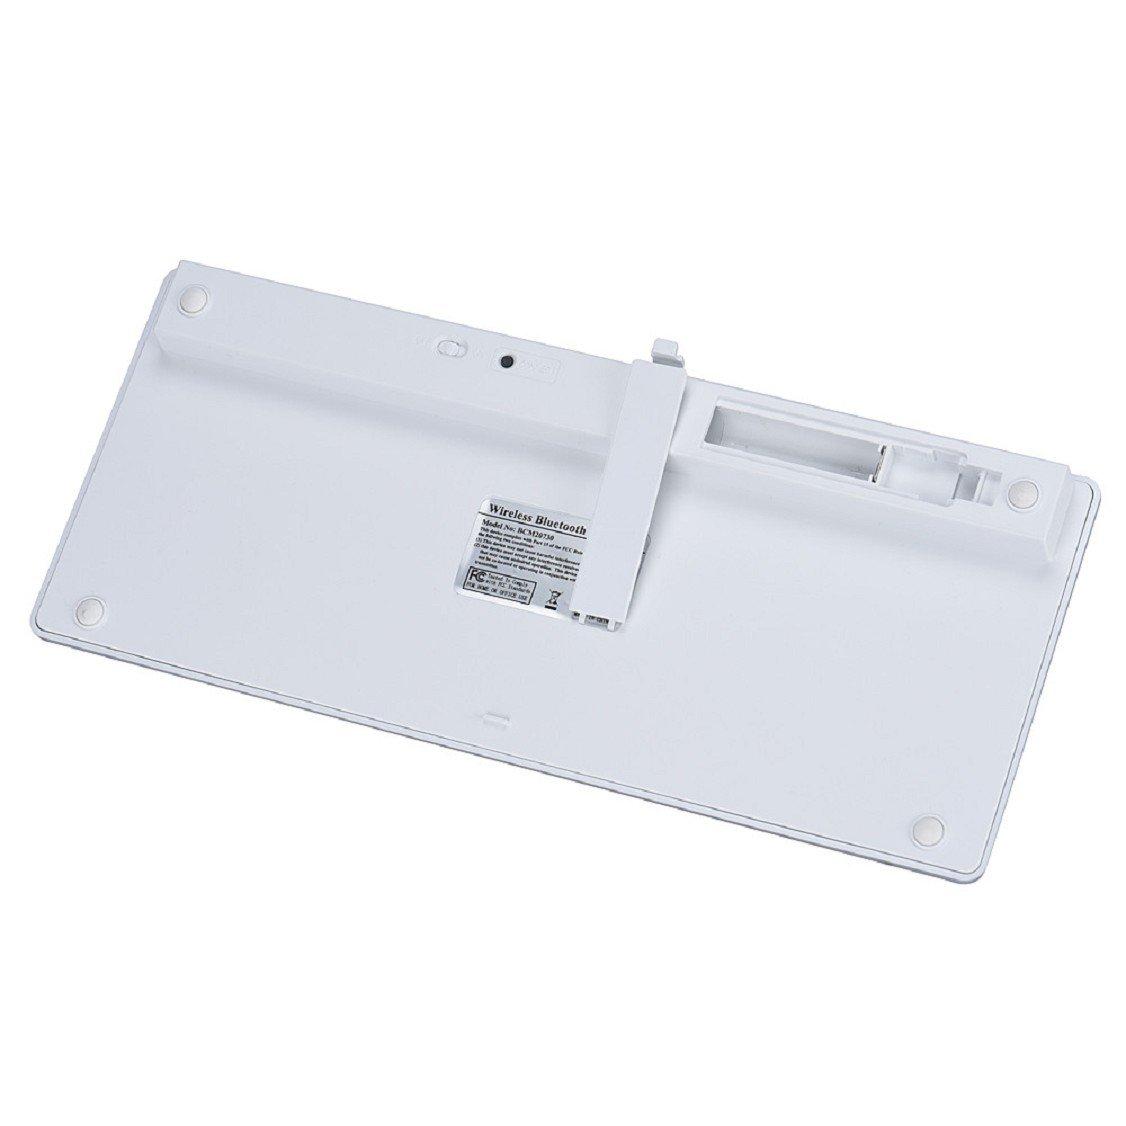 Egmy Hot! 2016 Slim Mini Bluetooth Wireless Keyboard for iPad Pro 9.7 /12.9 inch White by Egmy (Image #4)